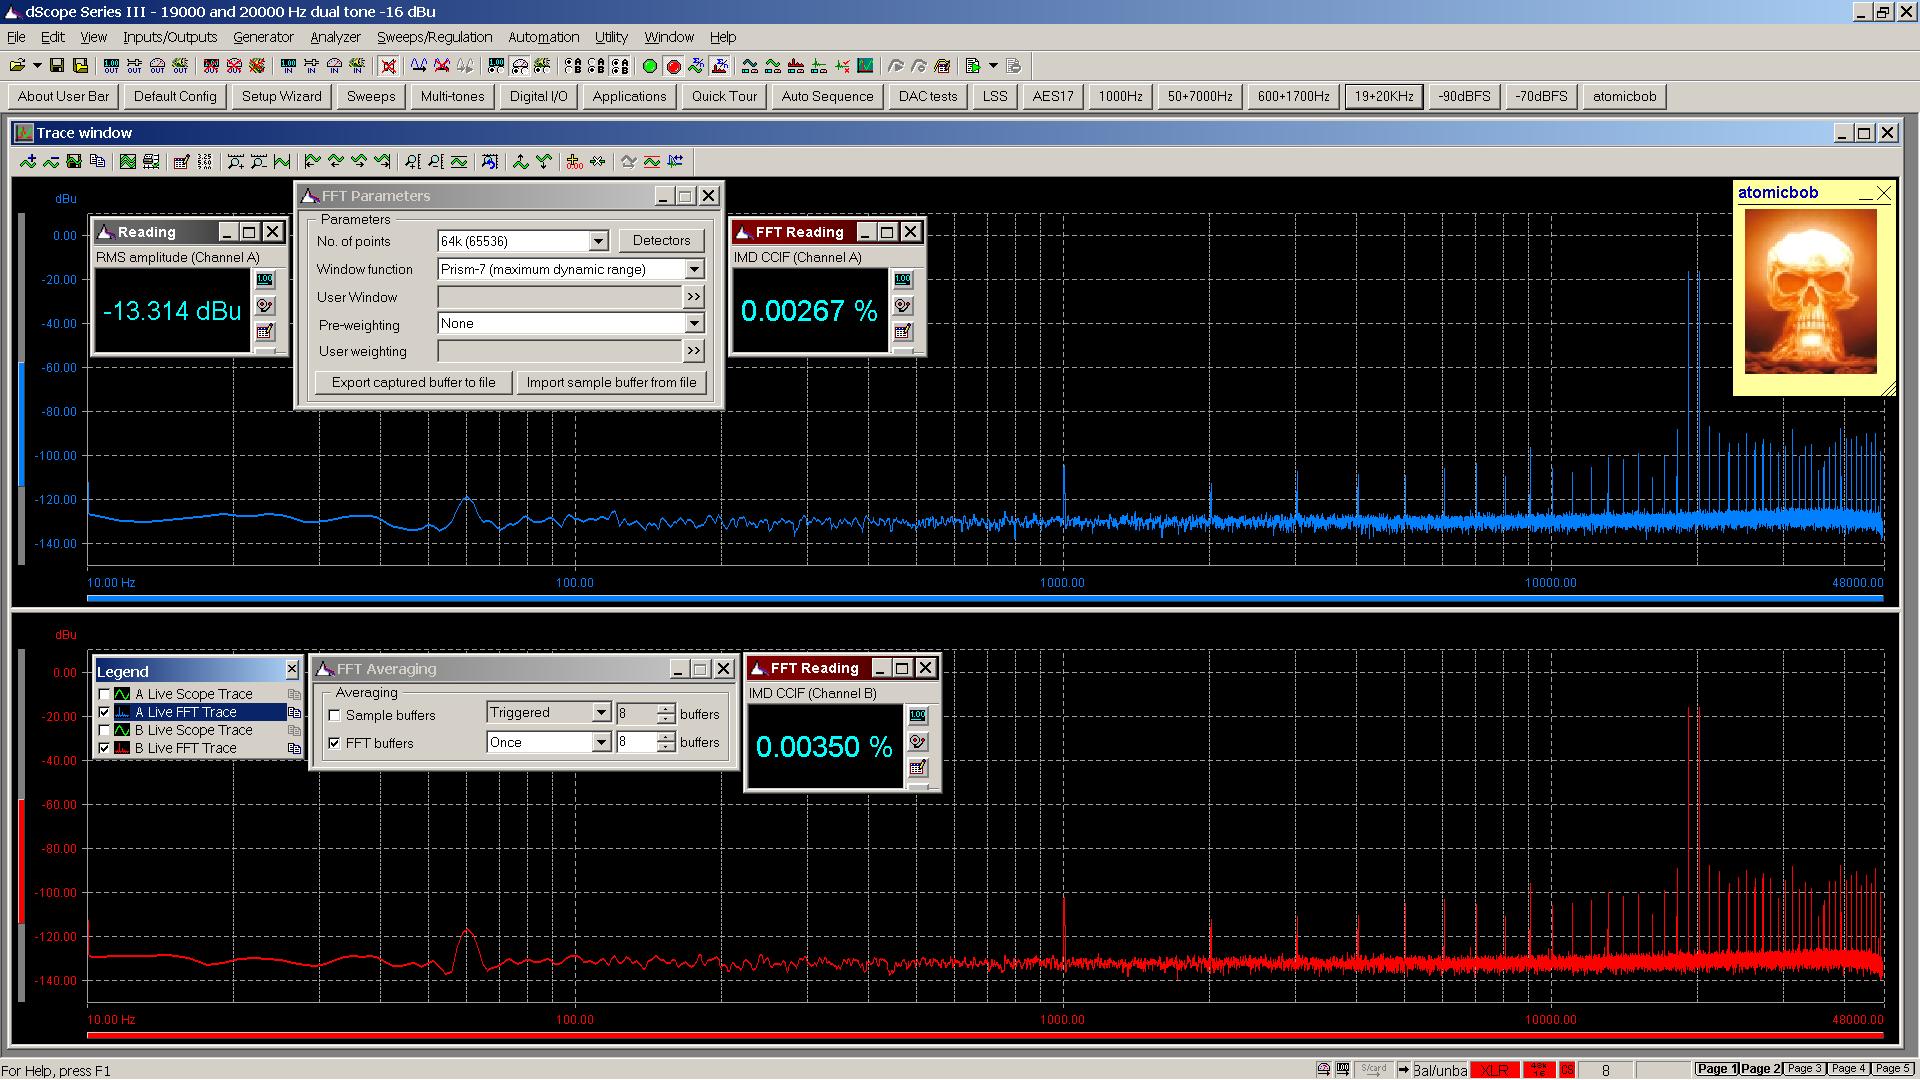 20180708-04 Modi MB SE IMD spectrum - spdif.PNG